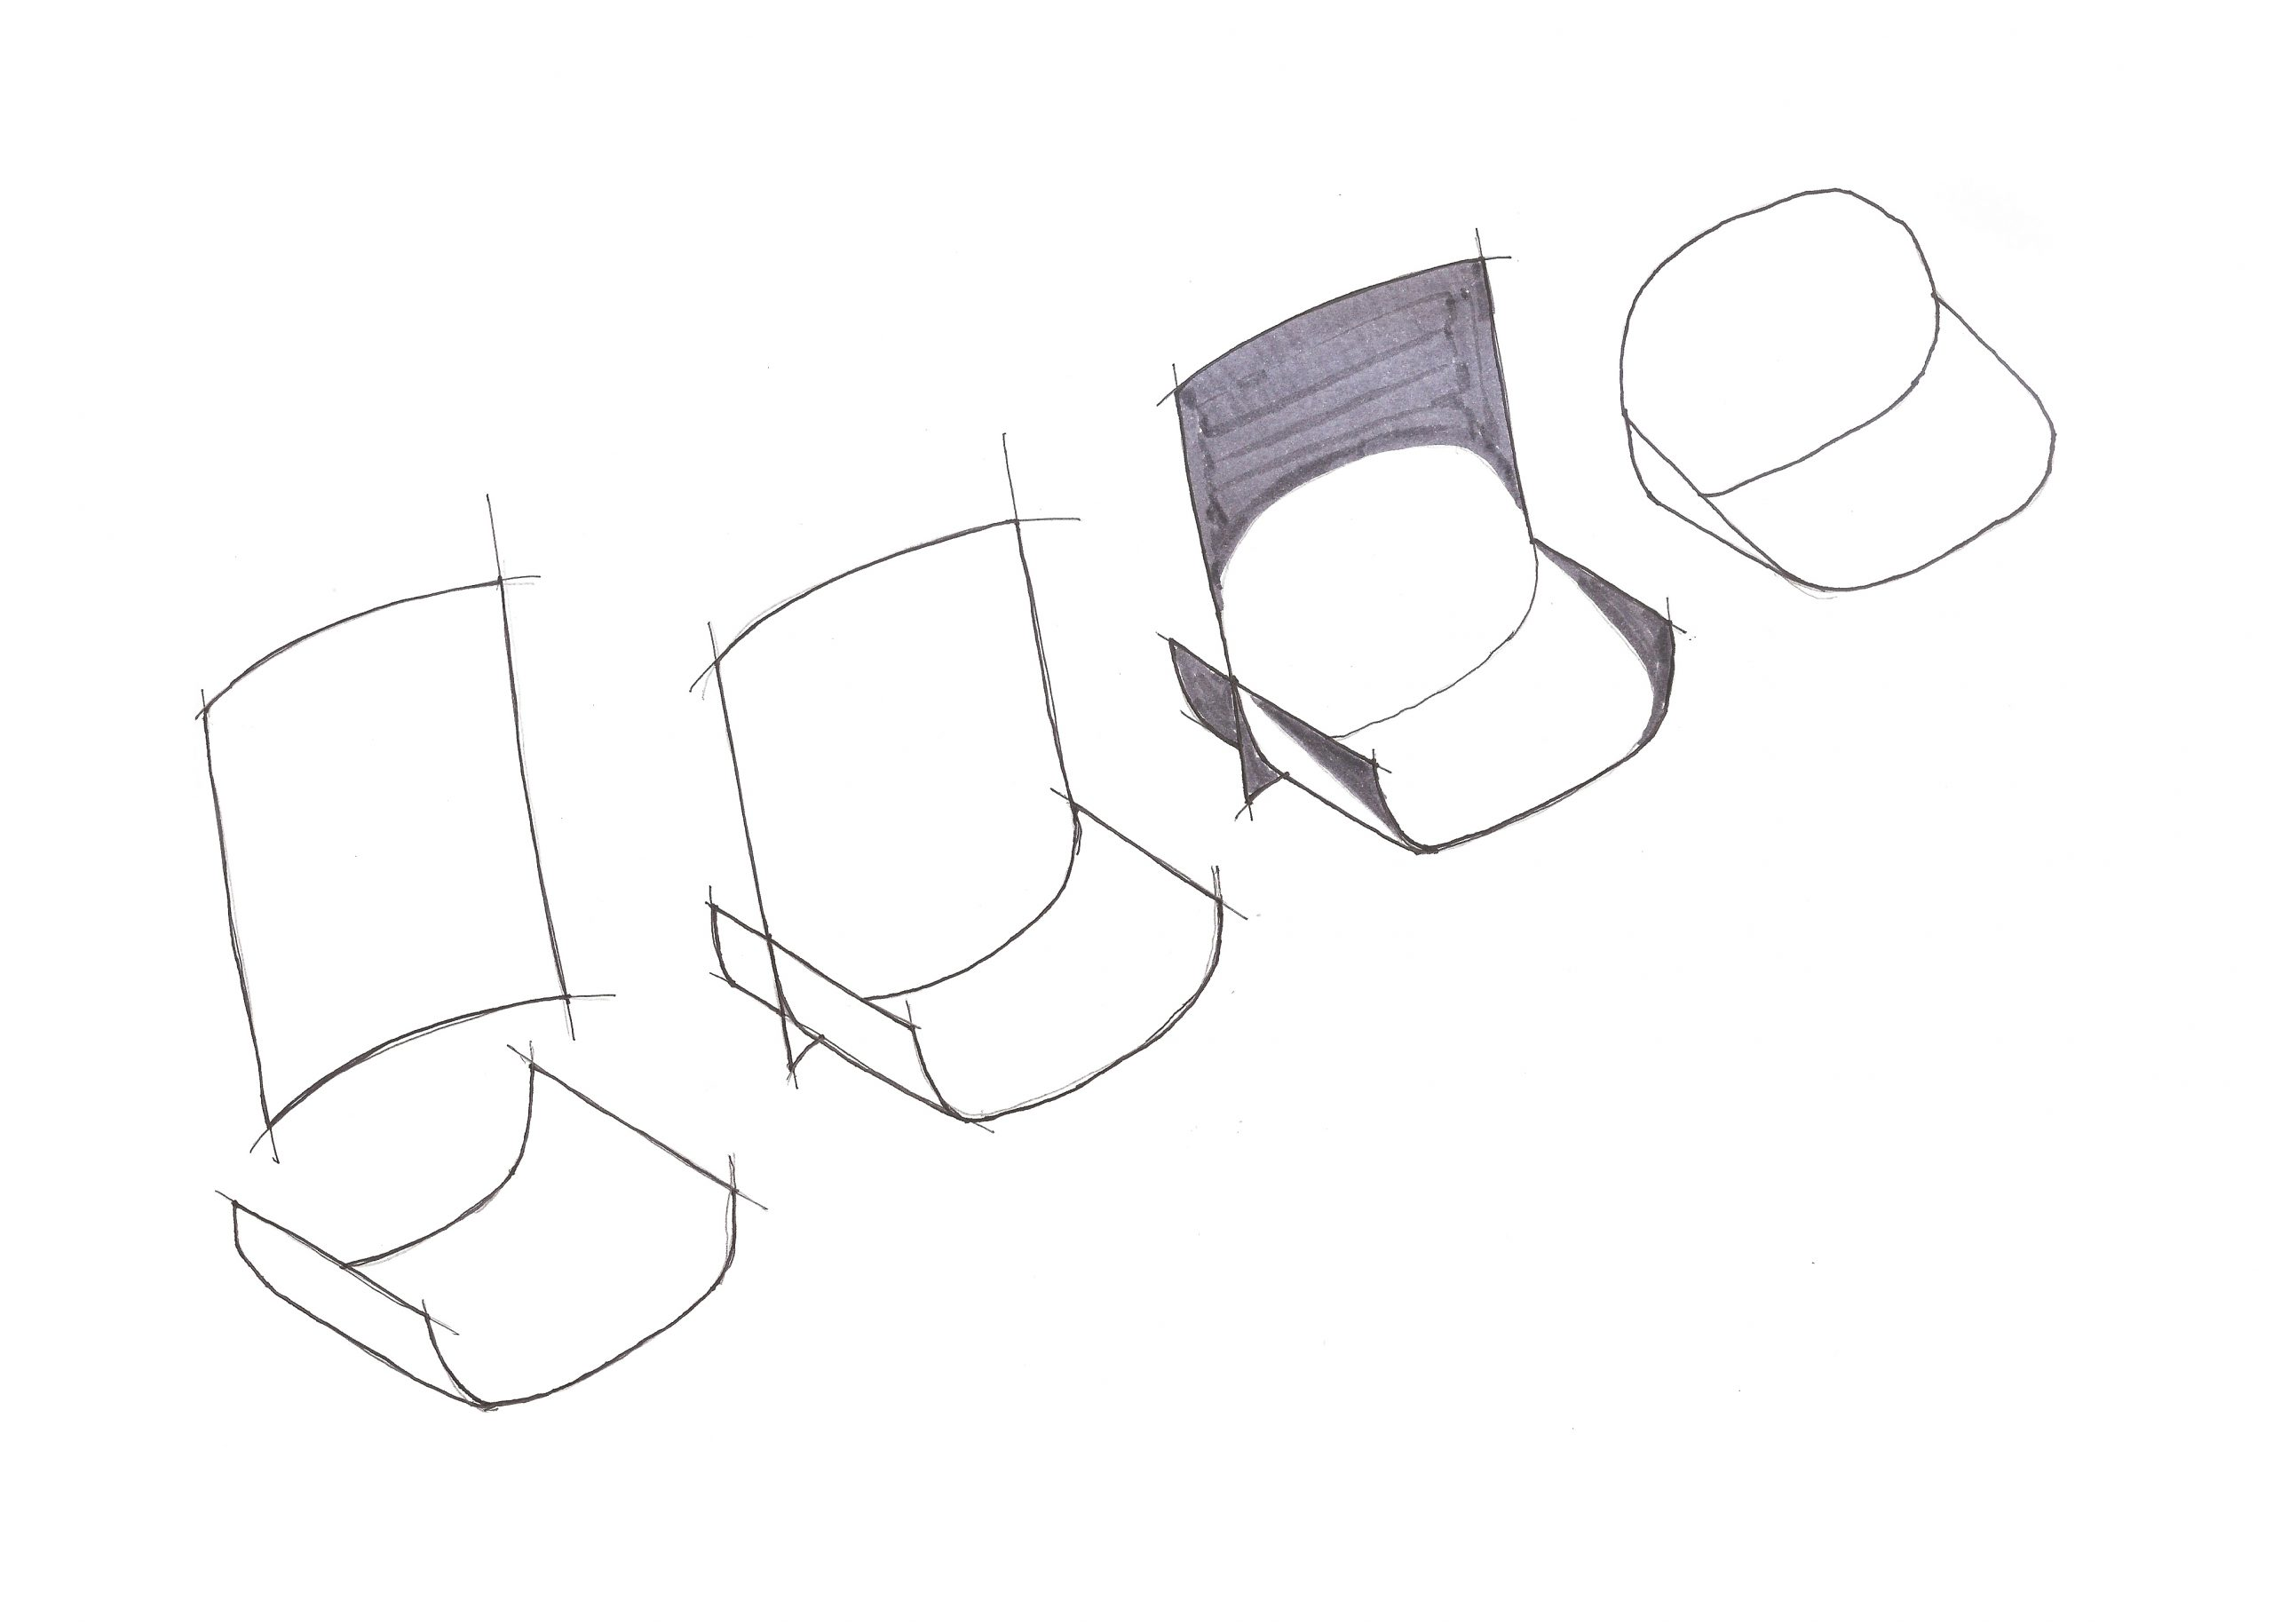 Elba chair design process sketch by Debiasi Sandri